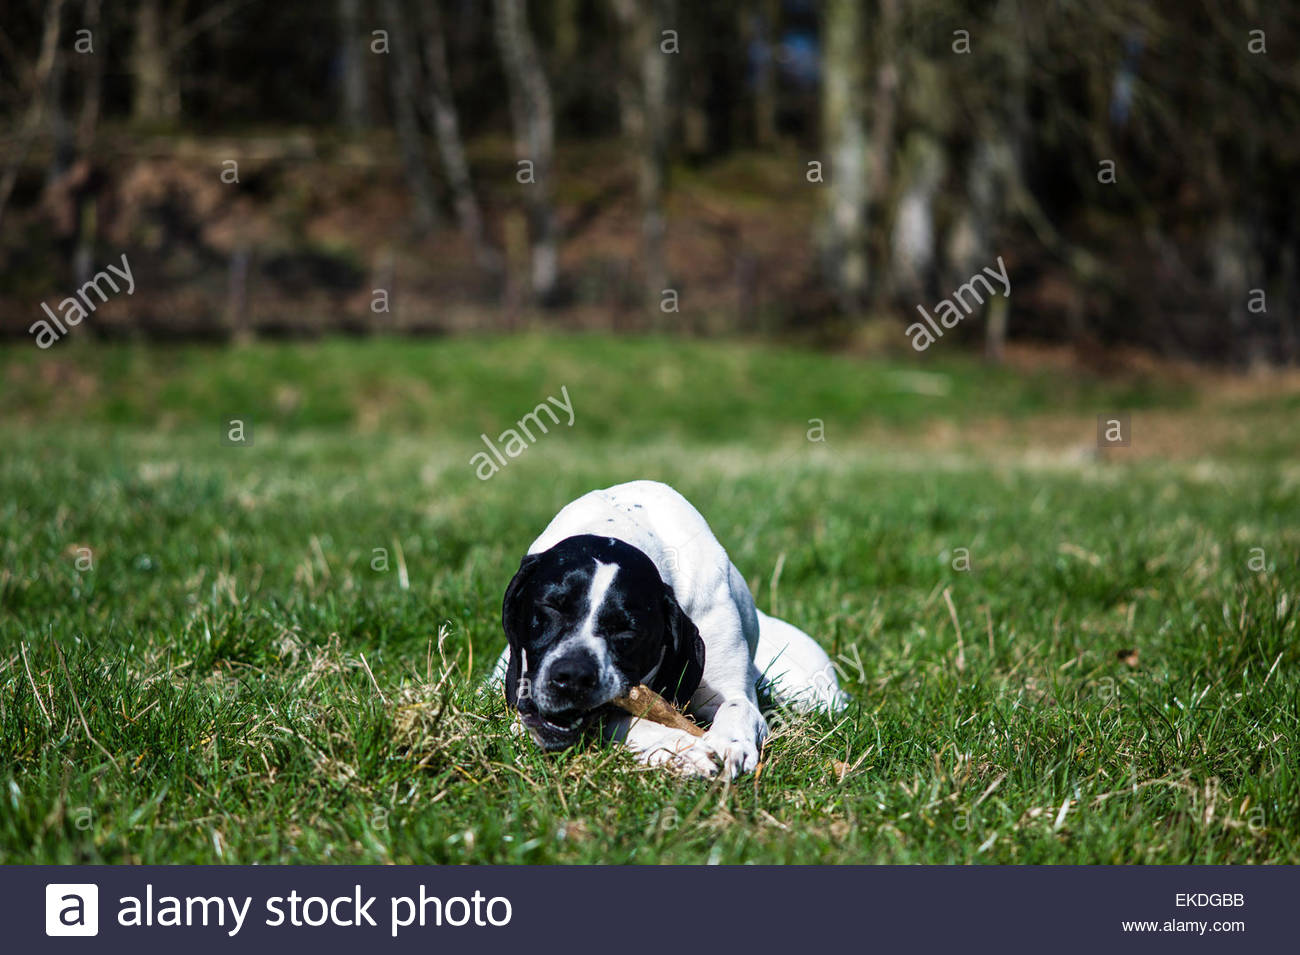 Pointer dog - Stock Image